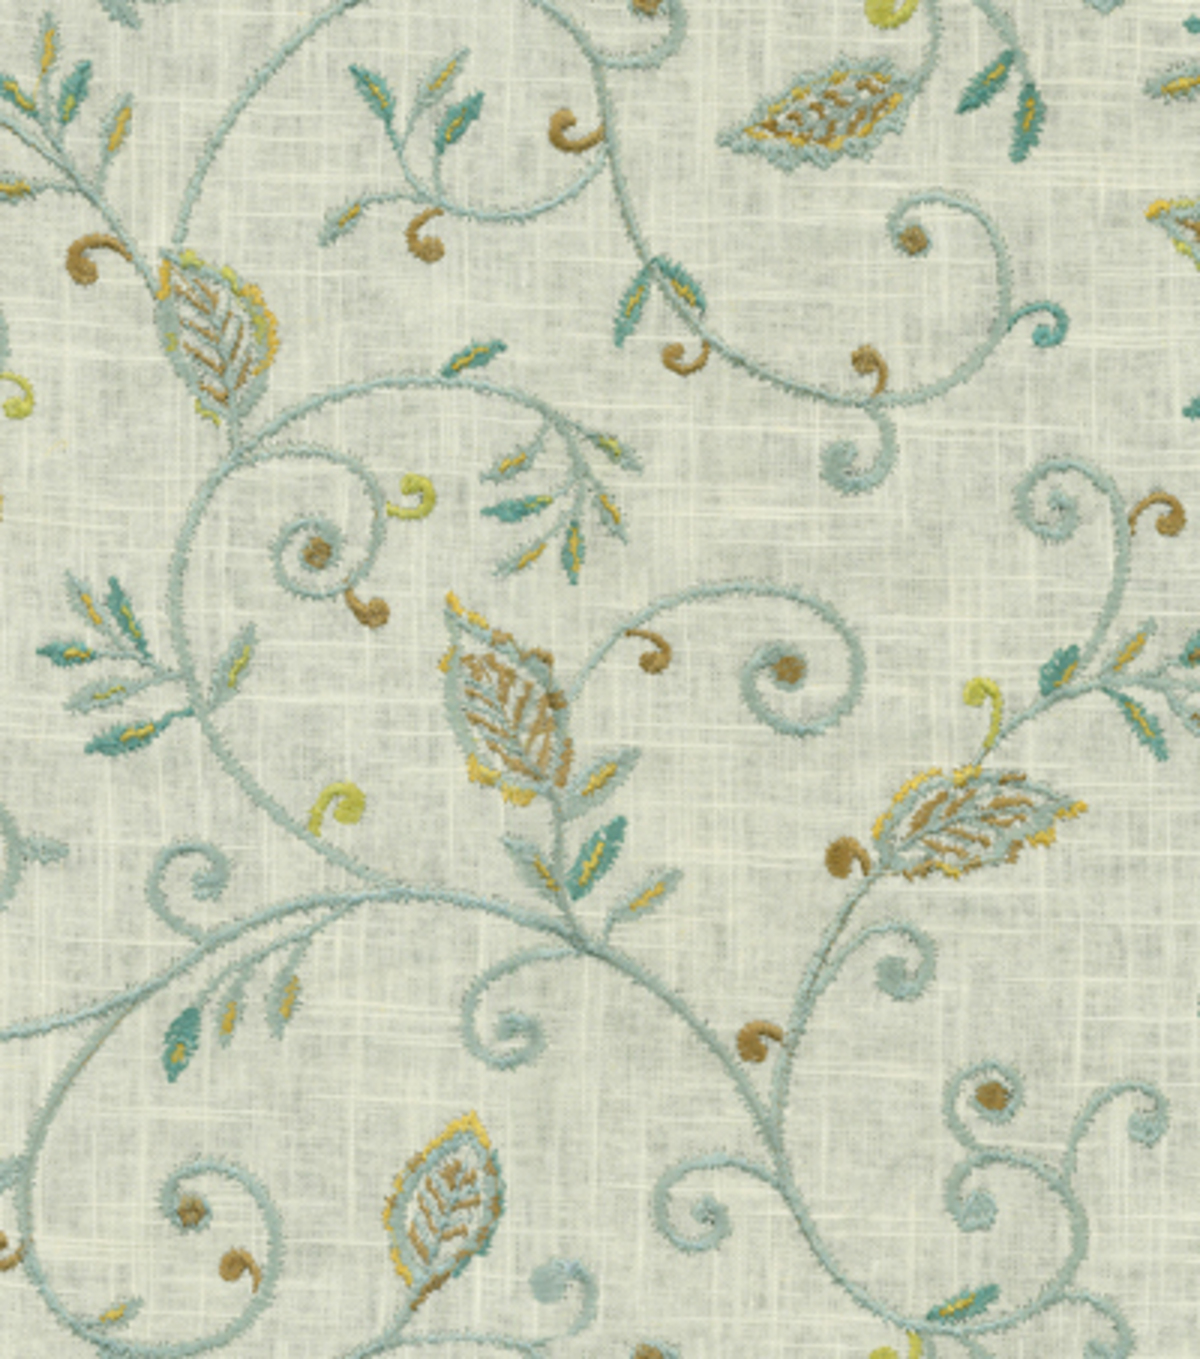 Upholstery Fabric Dena Kalia Embroidery Green Tea Joann